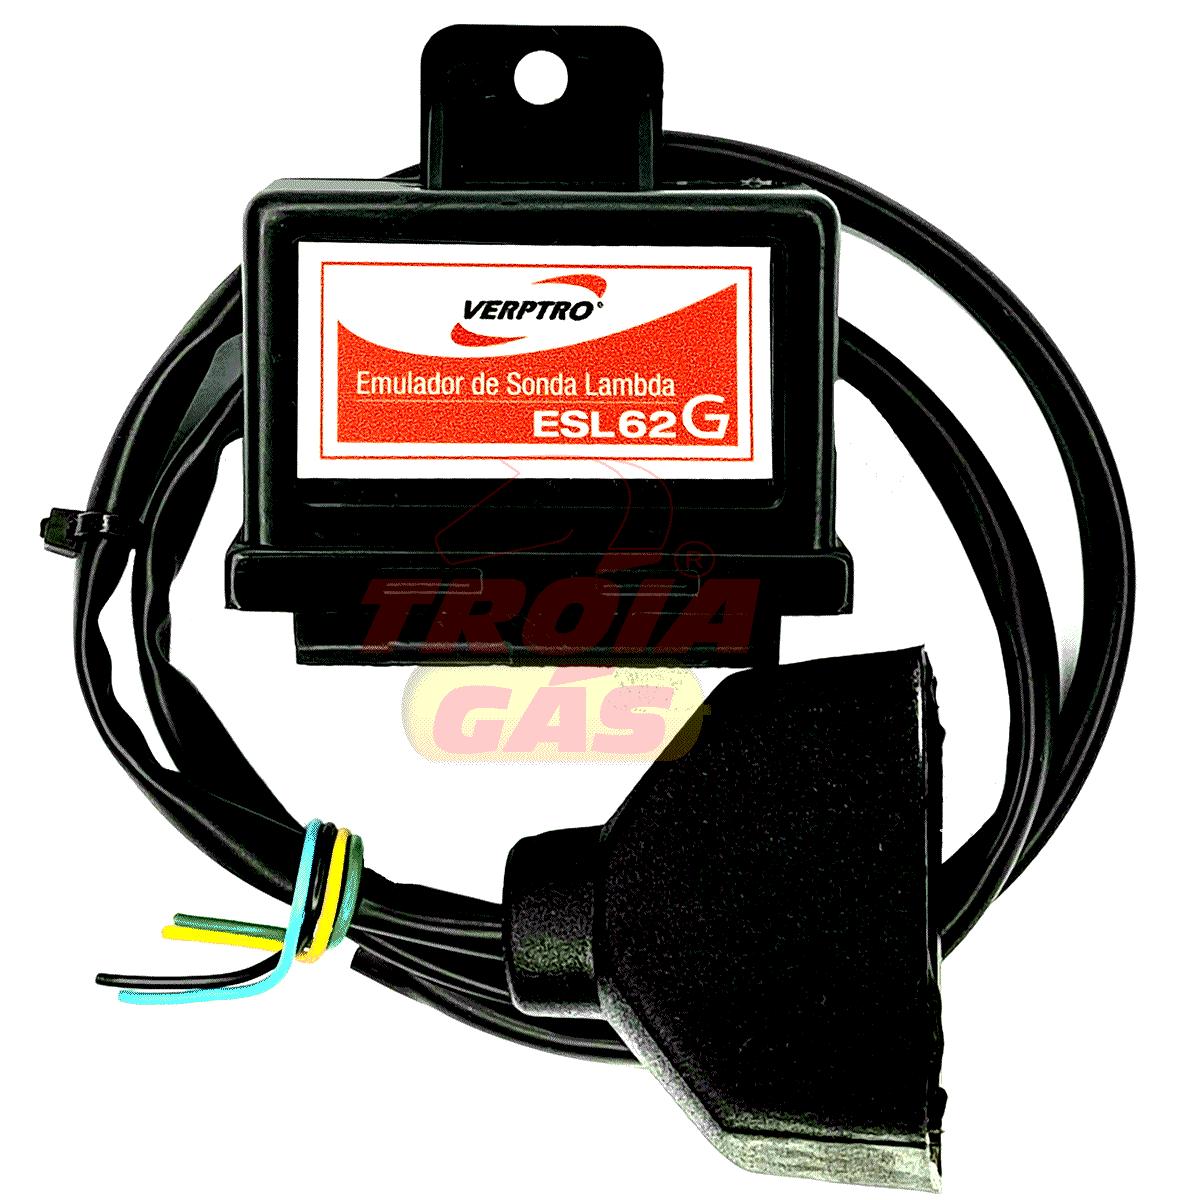 Kit Comutadora Tury Emulador Verptro 4 Bicos Simulador de Sonda Gasolina Fixo Versim4 ESL62G